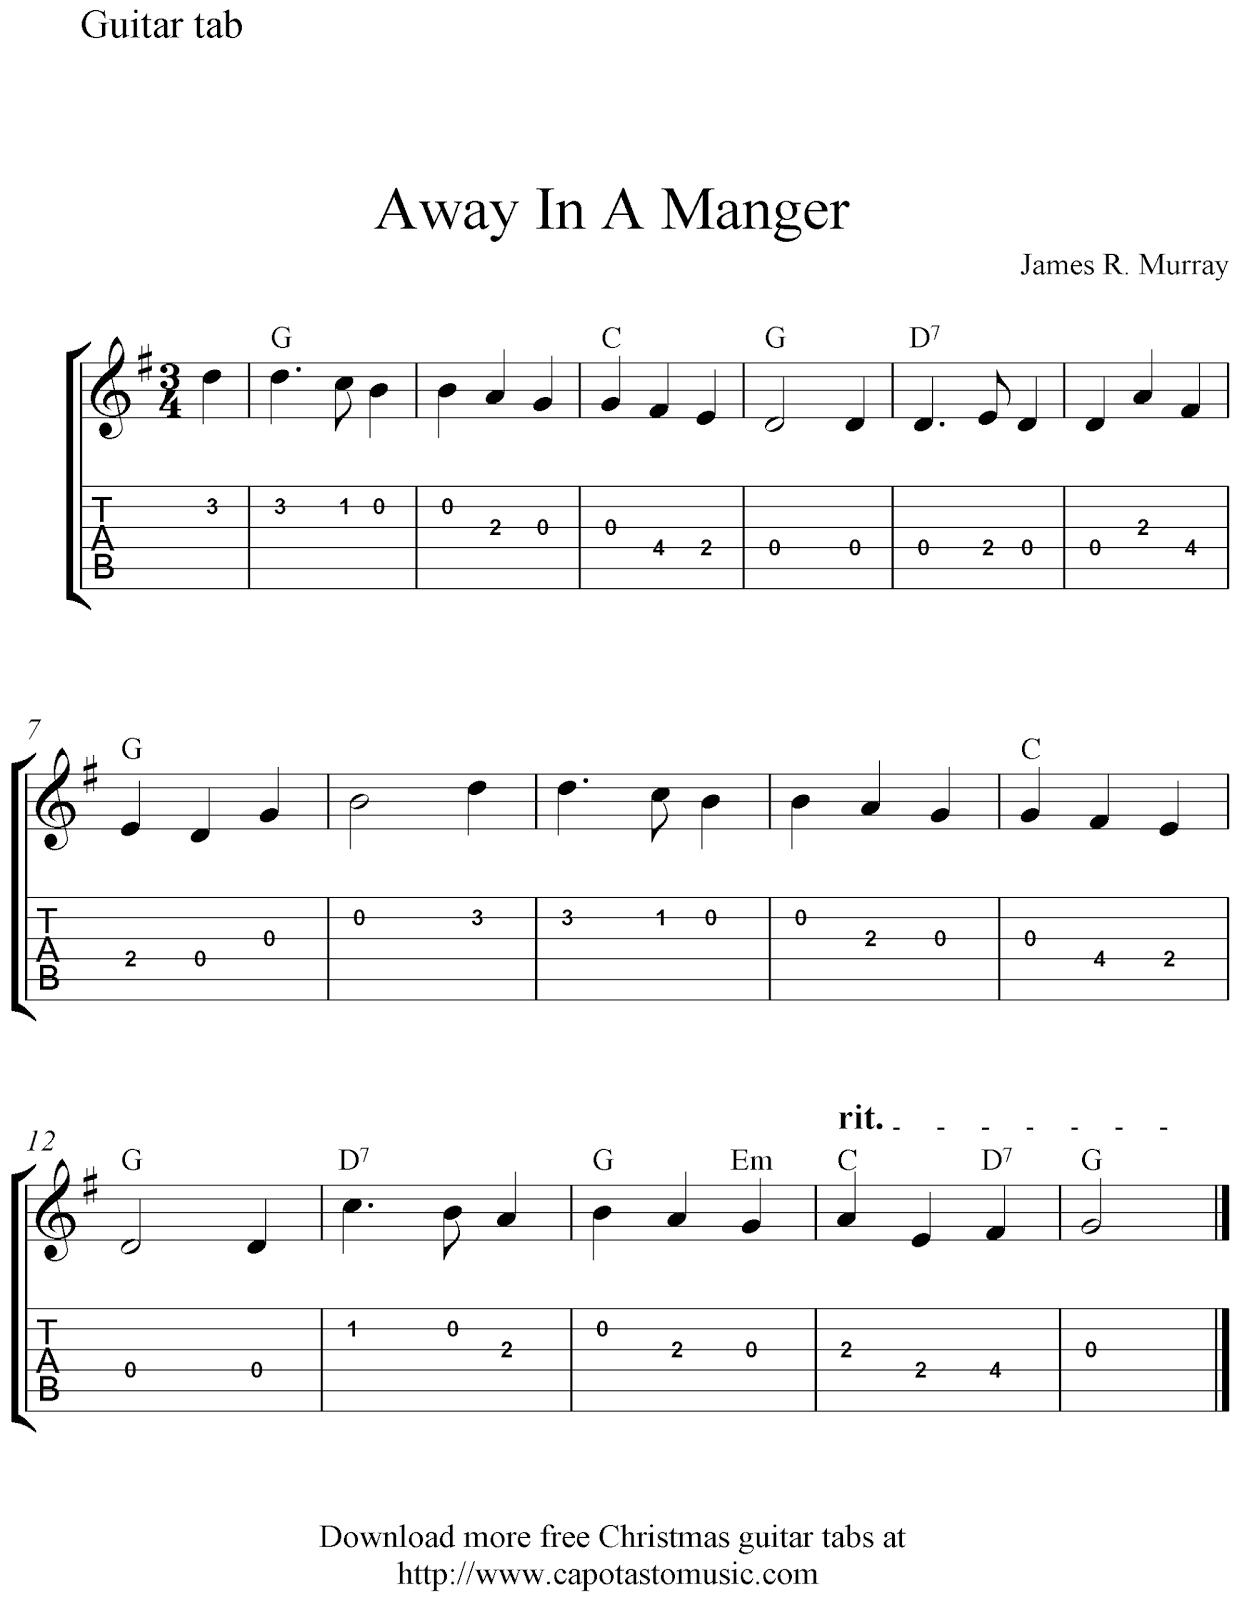 Free Sheet Music Scores: Free Easy Christmas Guitar Tablature Sheet - Free Printable Guitar Music